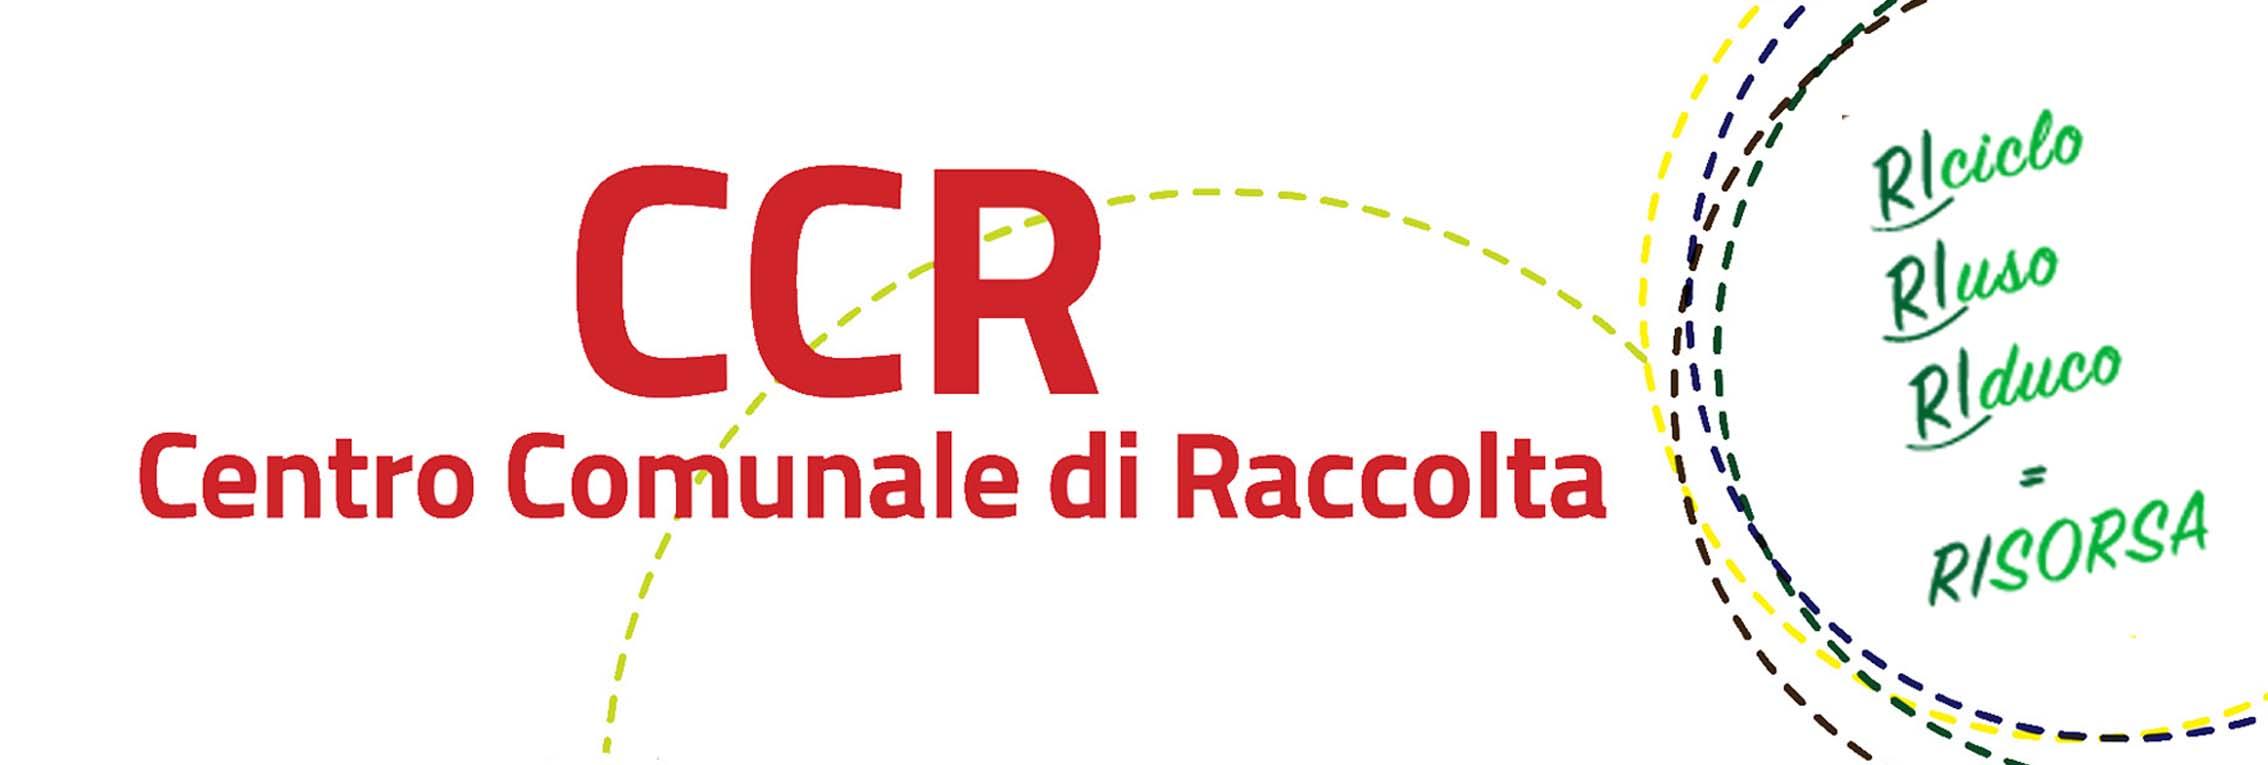 banner-sito-ccr